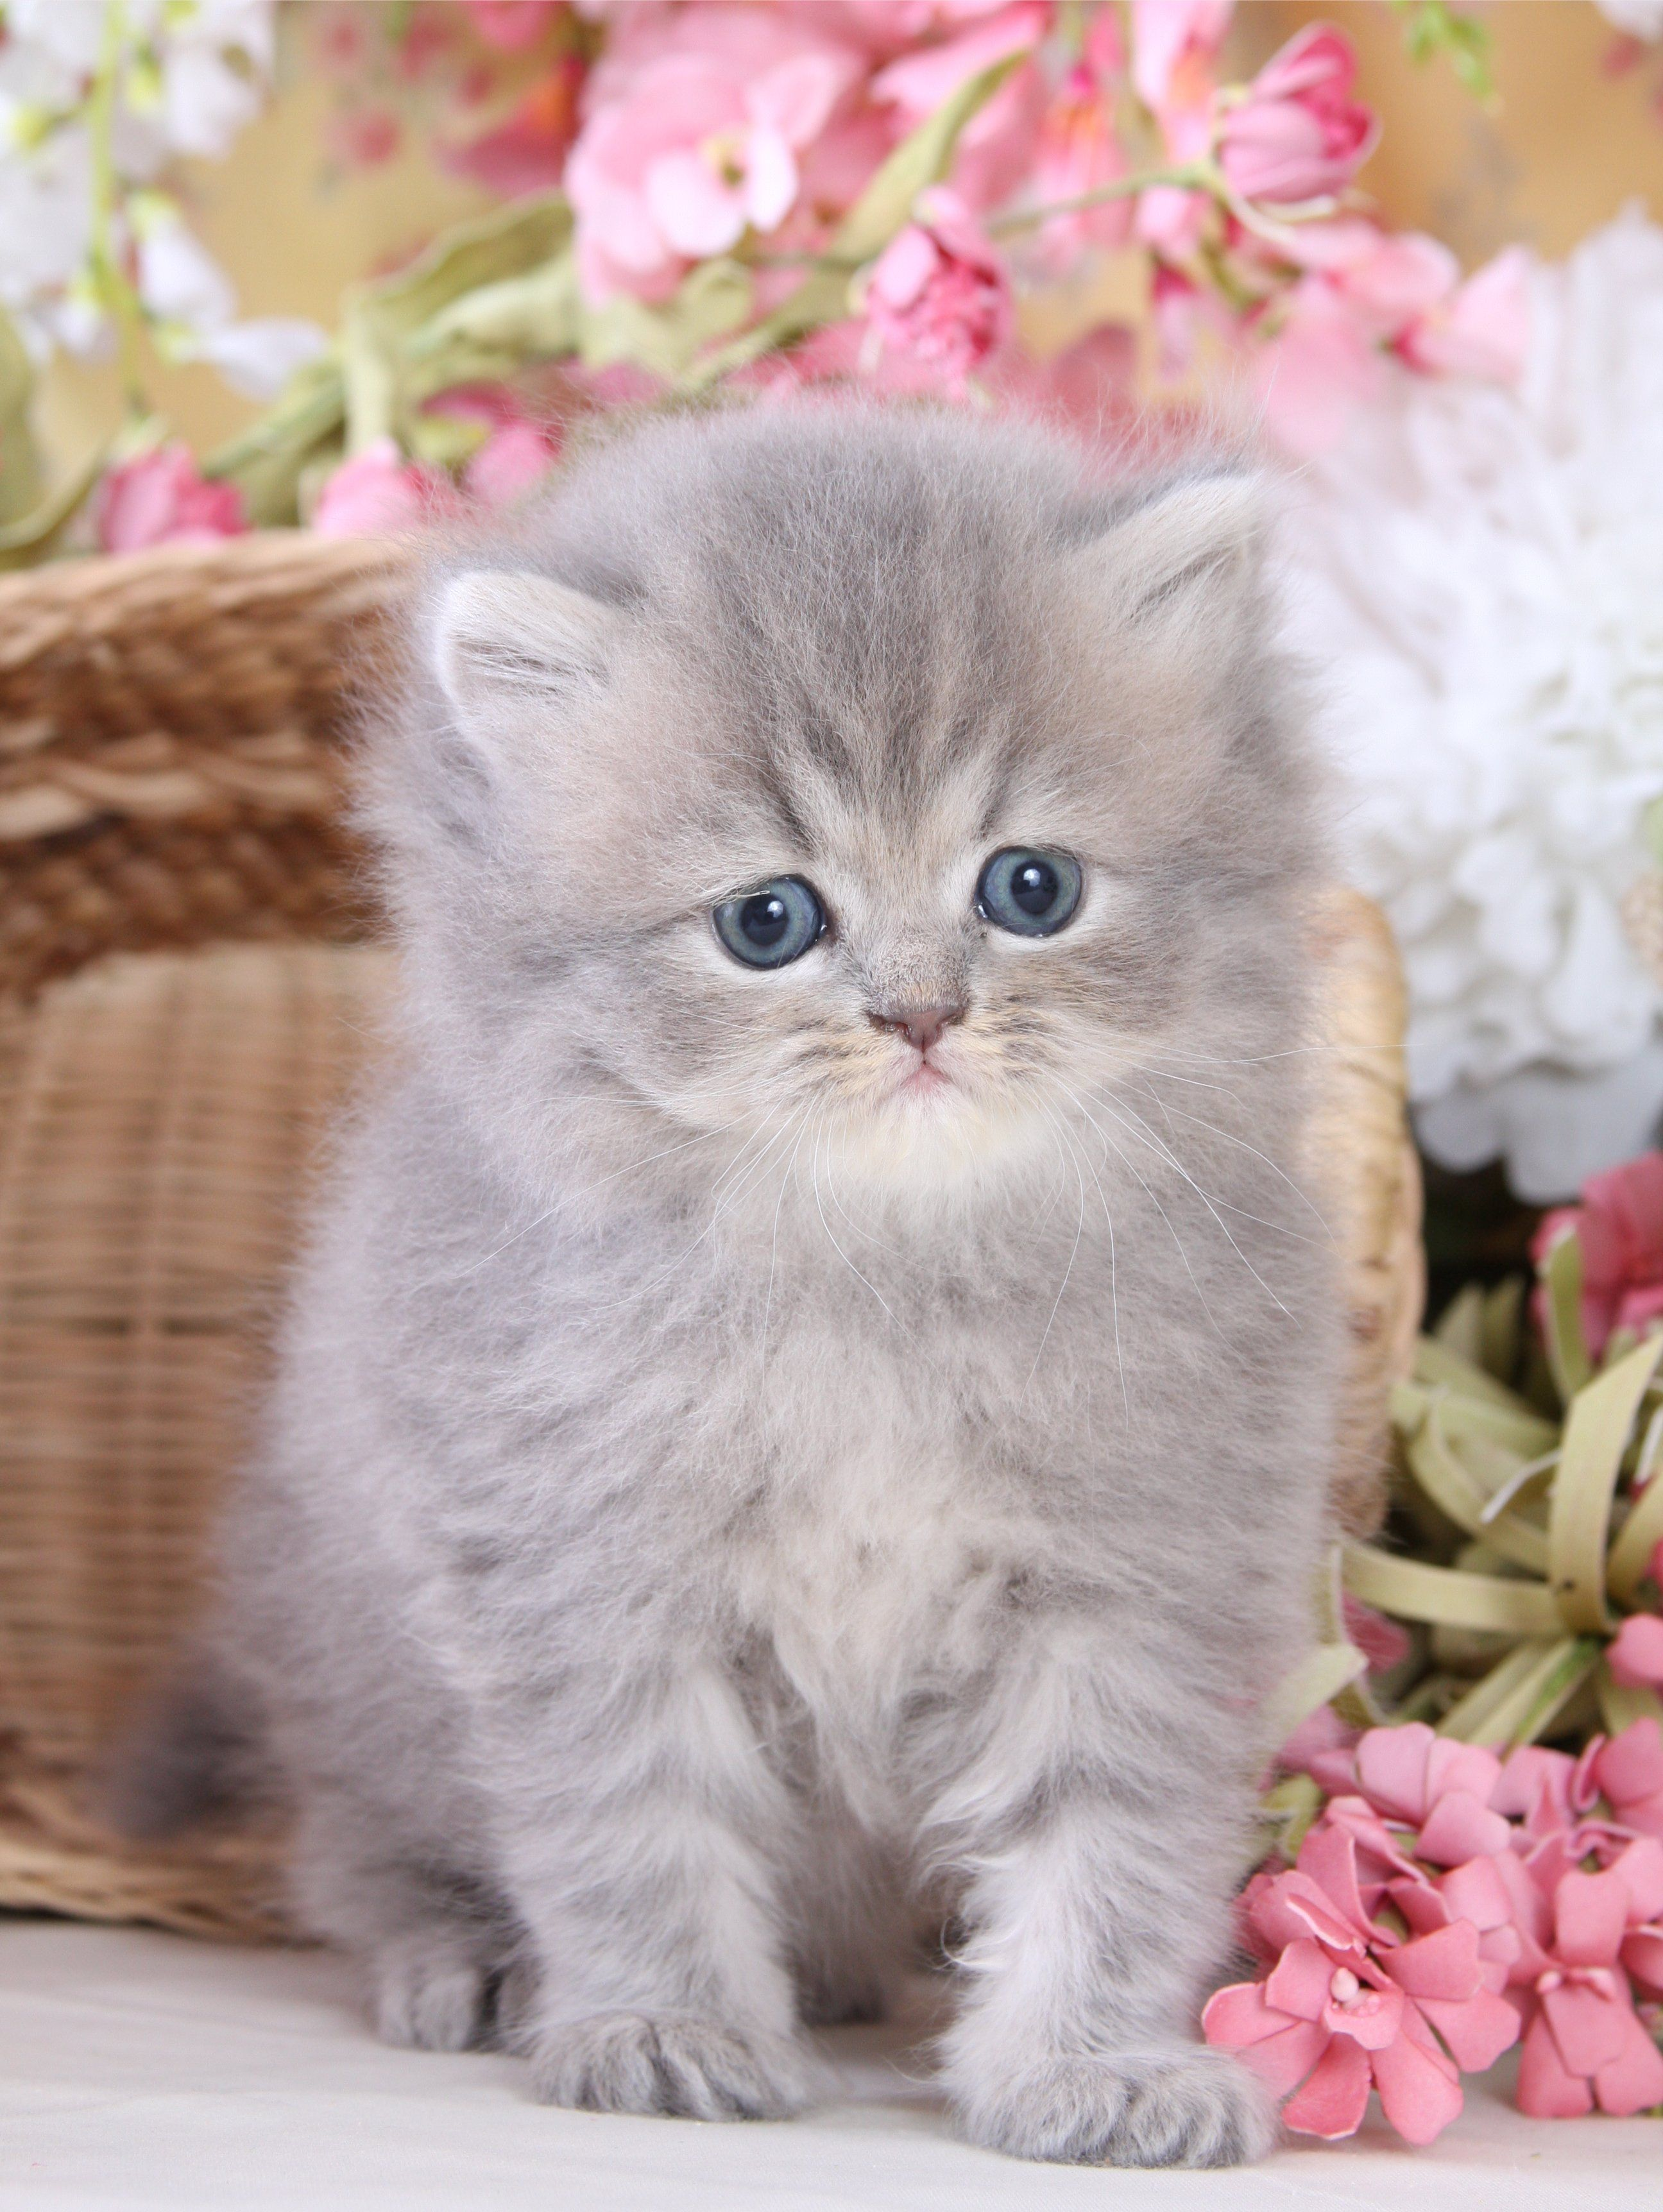 teacup doll face persian kittens Car Tuning Teacup